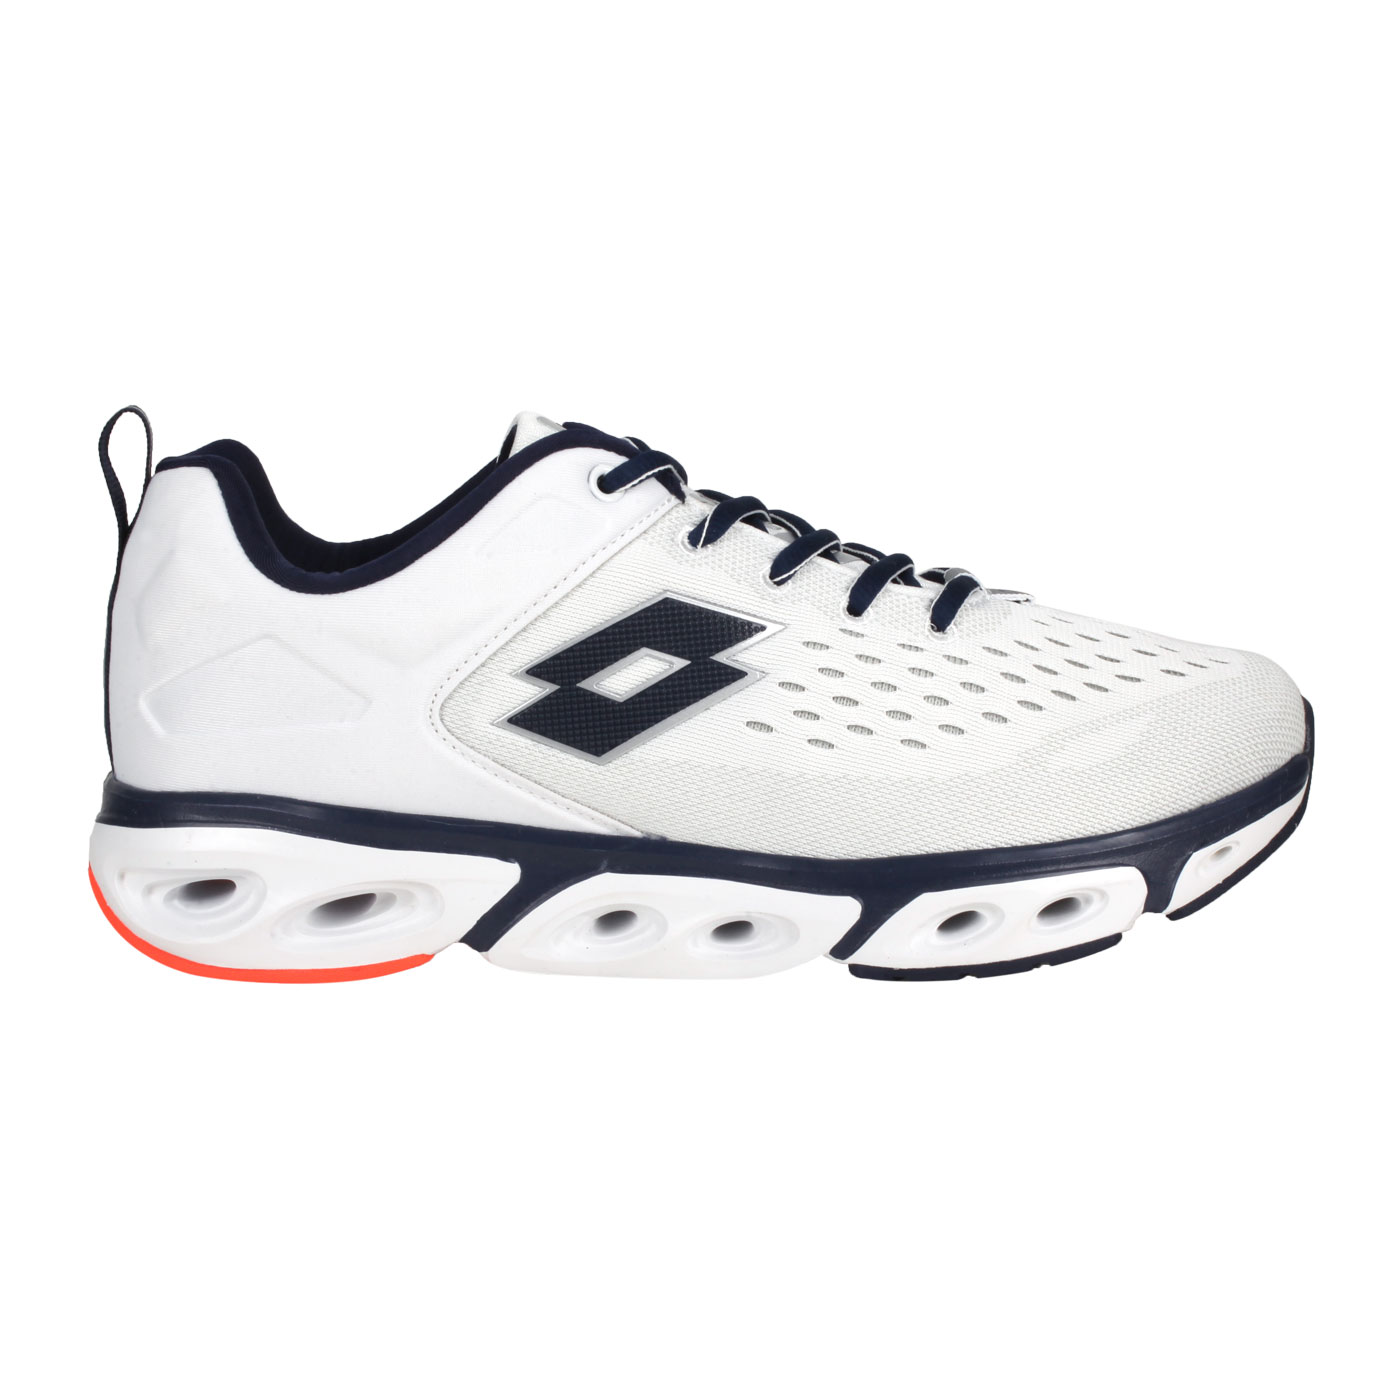 LOTTO 男款風動運動鞋 LT1AMR3599